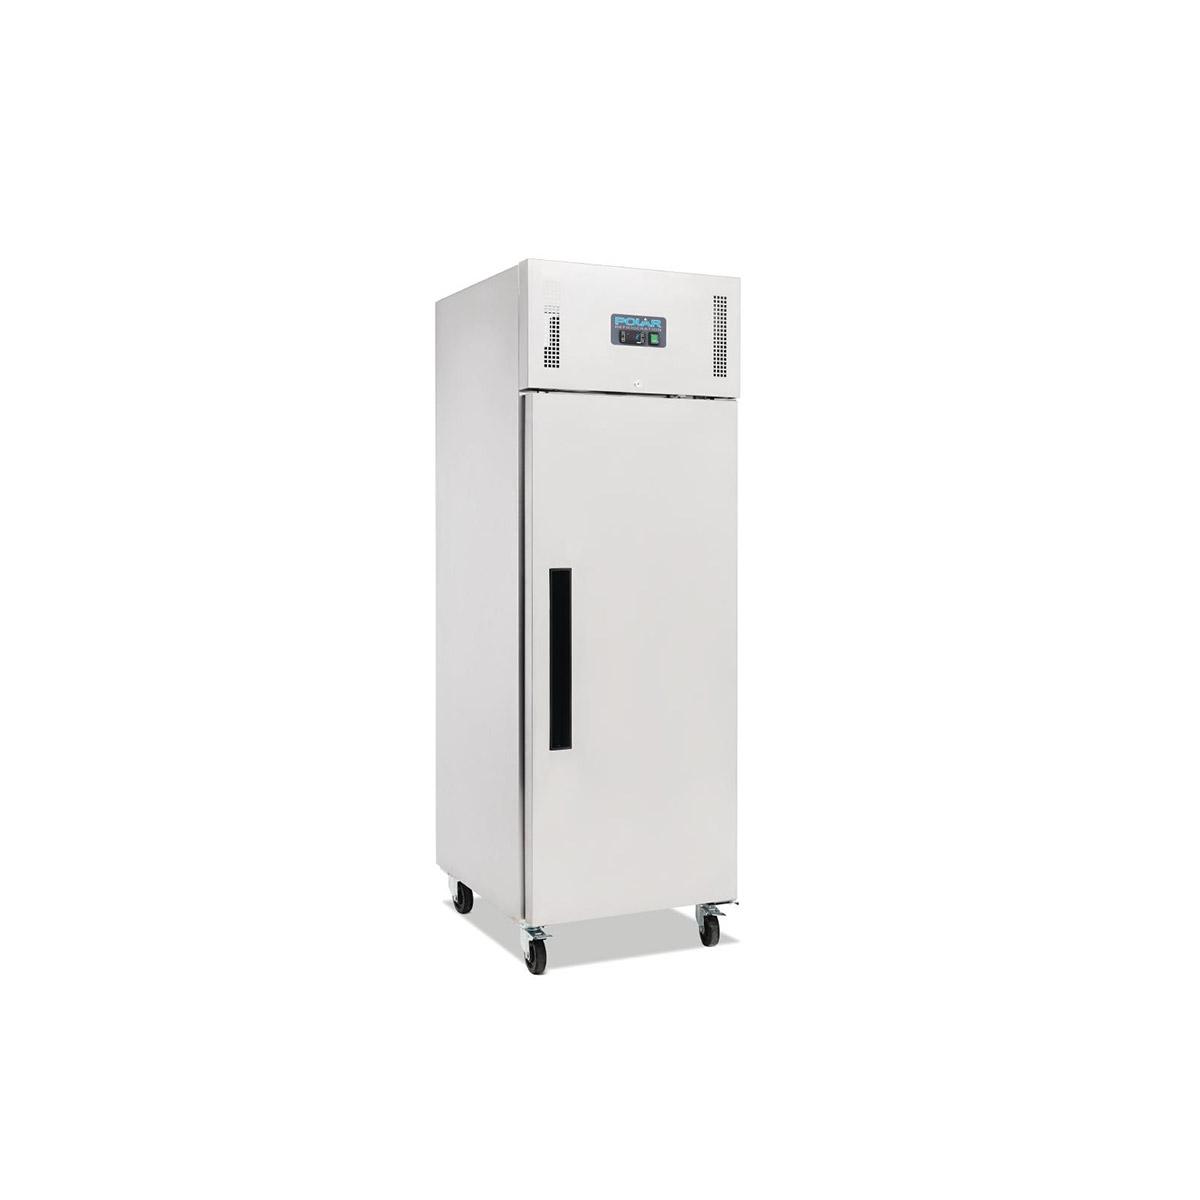 Polar G-Series Upright Freezer 600Ltr